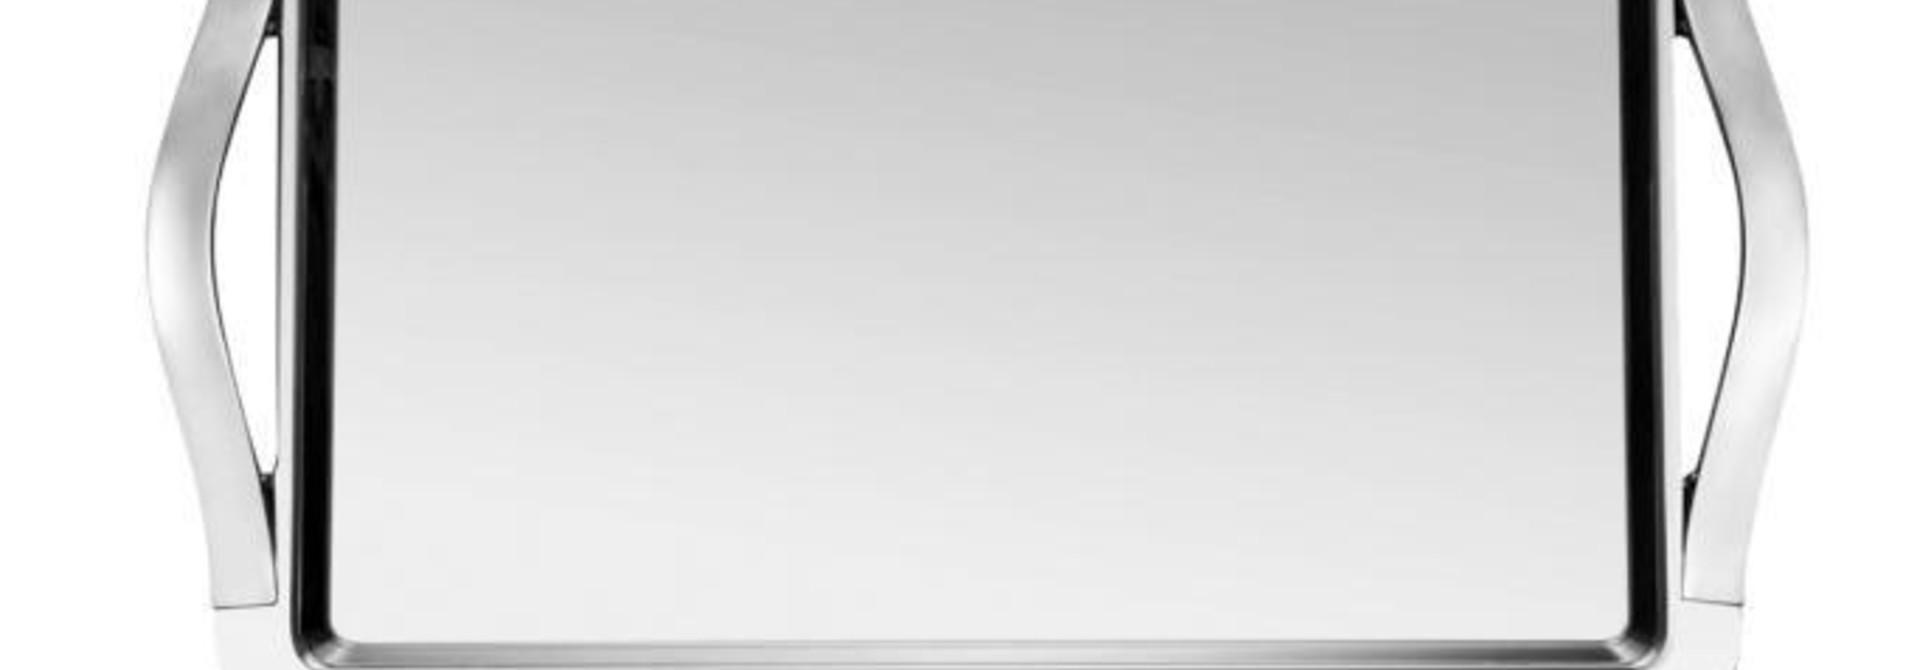 GUY DEGRENNE - Newport Stainless Steel Tray 65x53cm